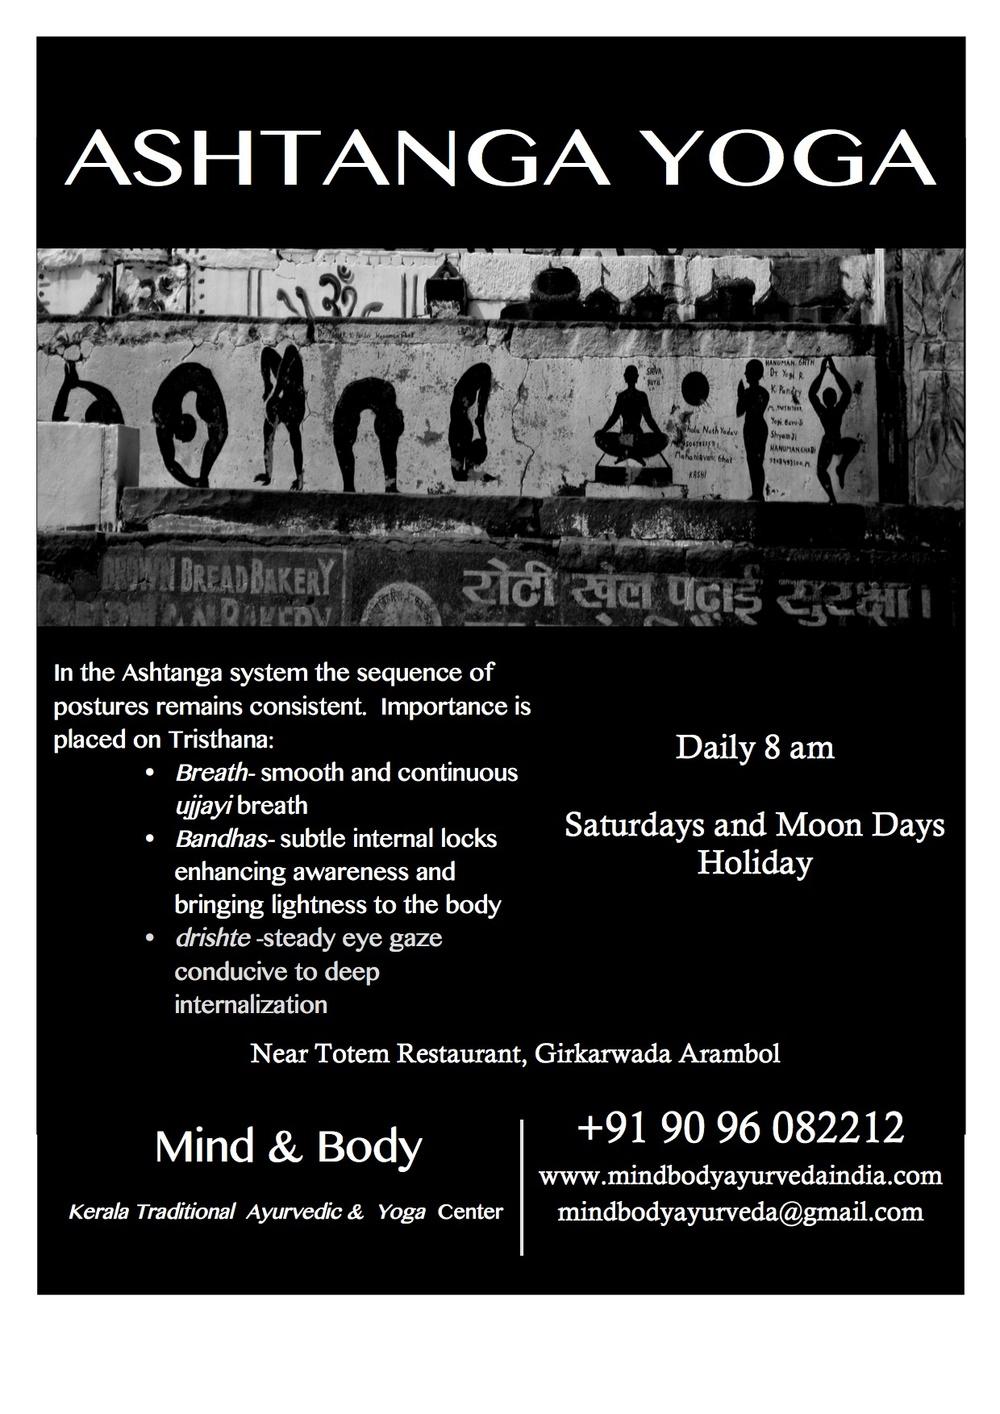 Ashtanga Poster Goa.jpg